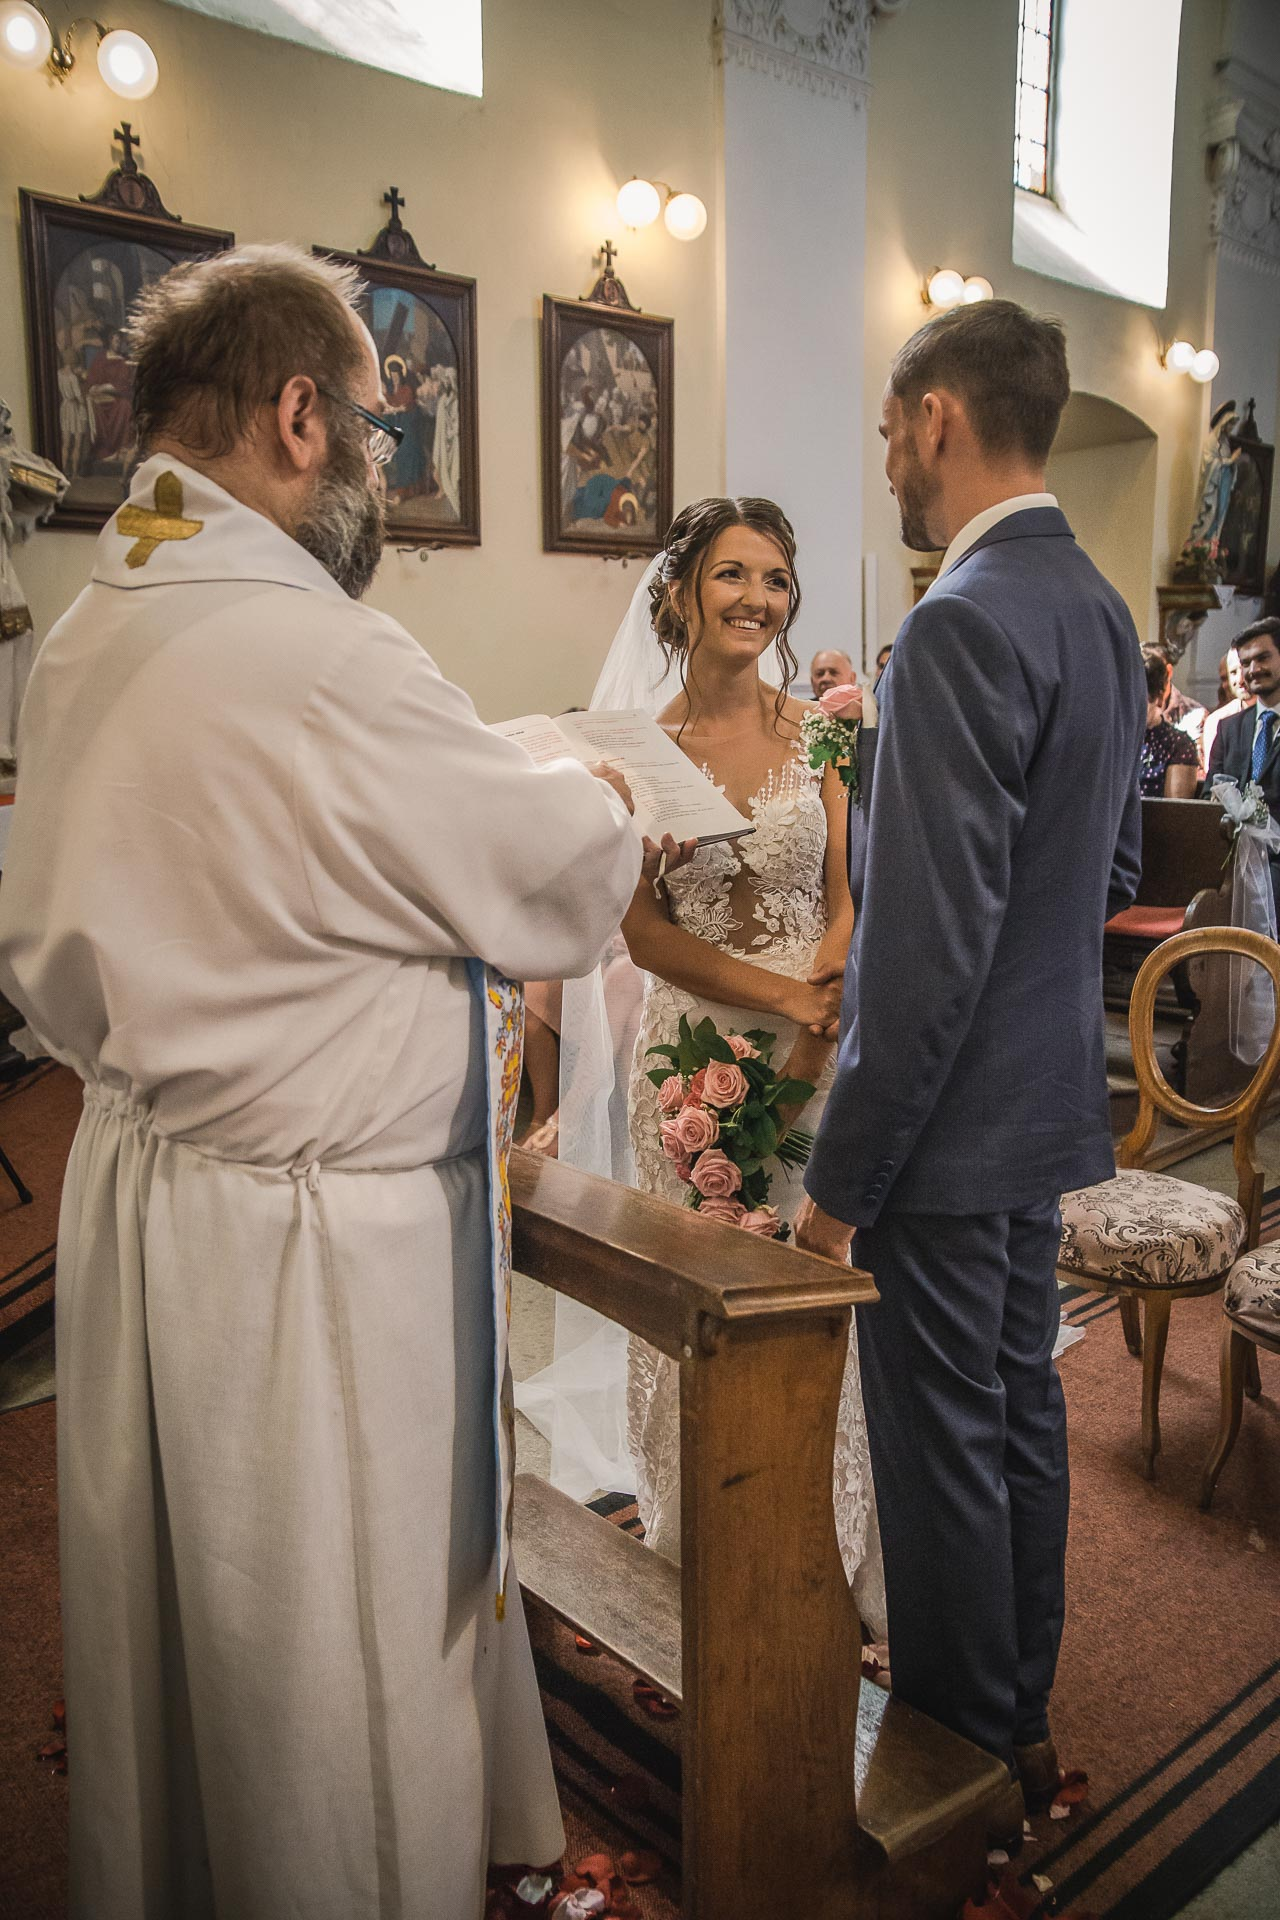 svatební-fotograf-wedding-svatebni-video-orlík-vltava-kostel-statek-stodola-boho-svatba-Beautyfoto-228